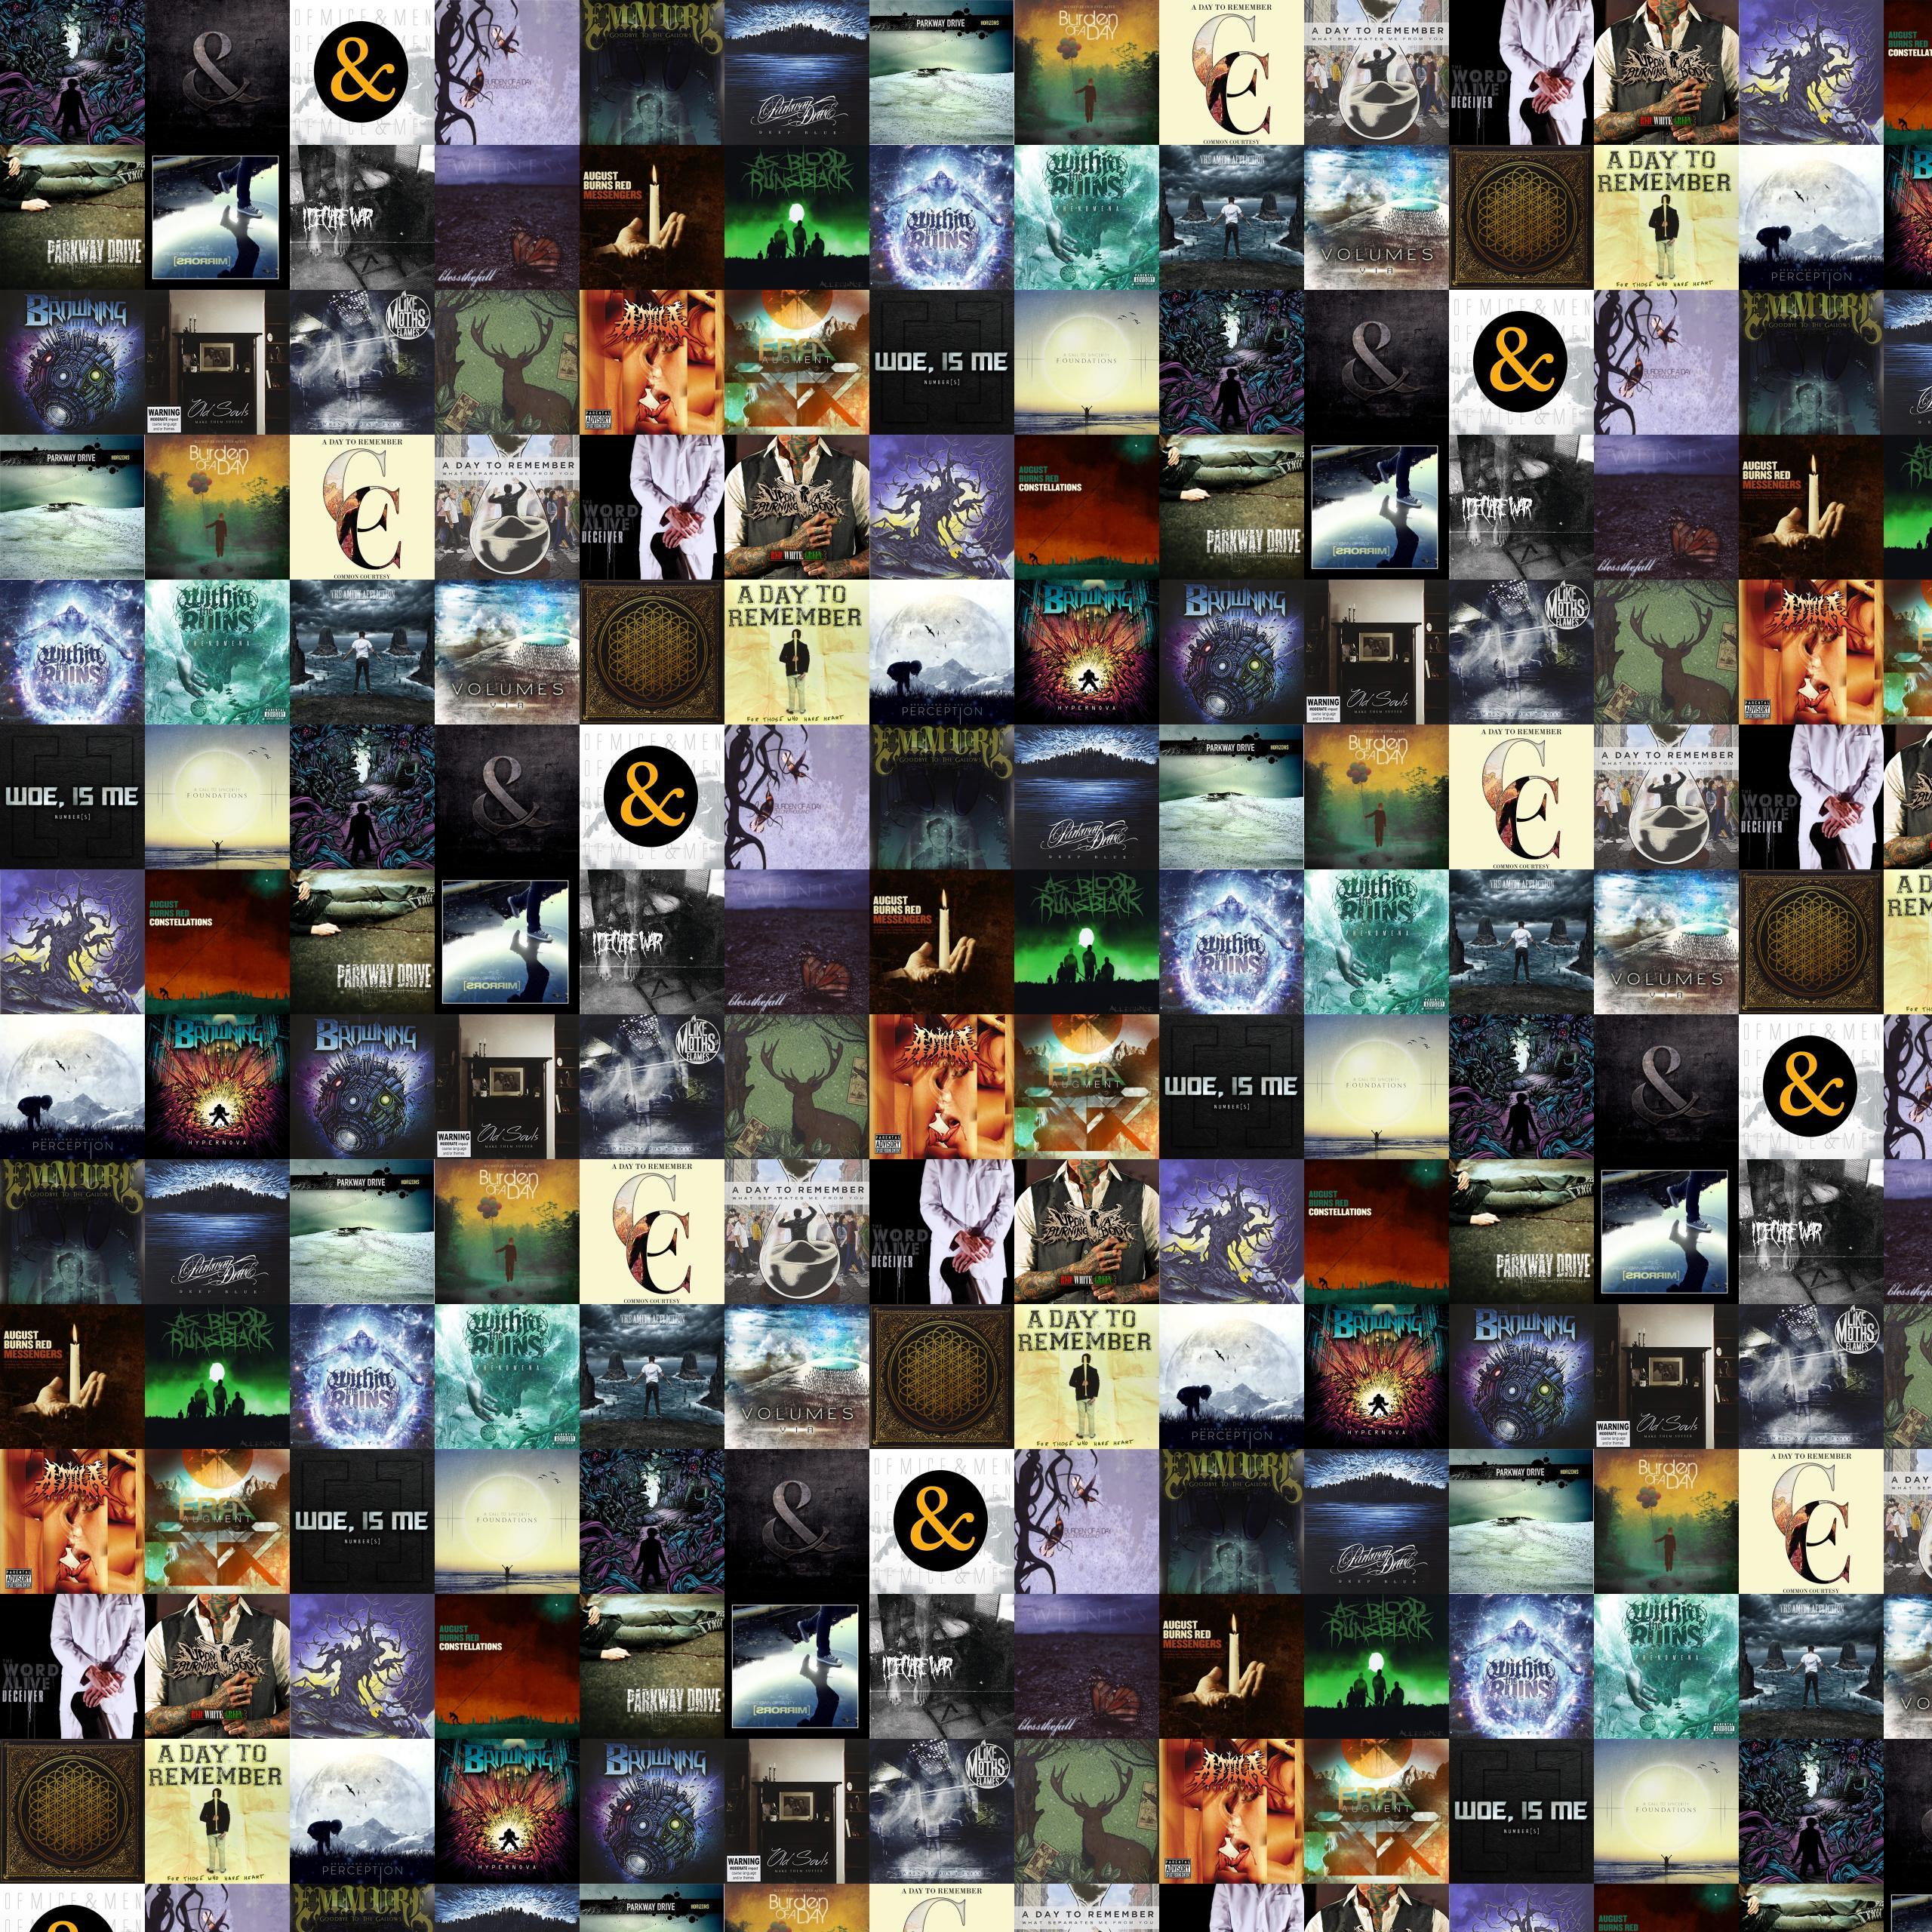 burden of a day « Tiled Desktop Wallpaper